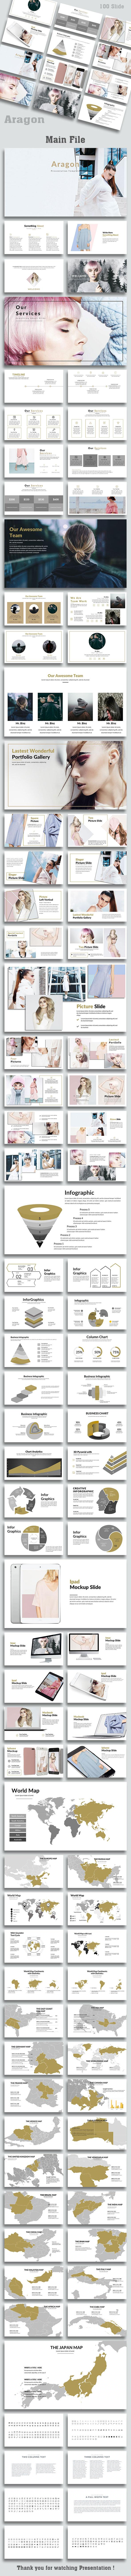 Aragon - Creative Google Slides Template - Google Slides Presentation Templates